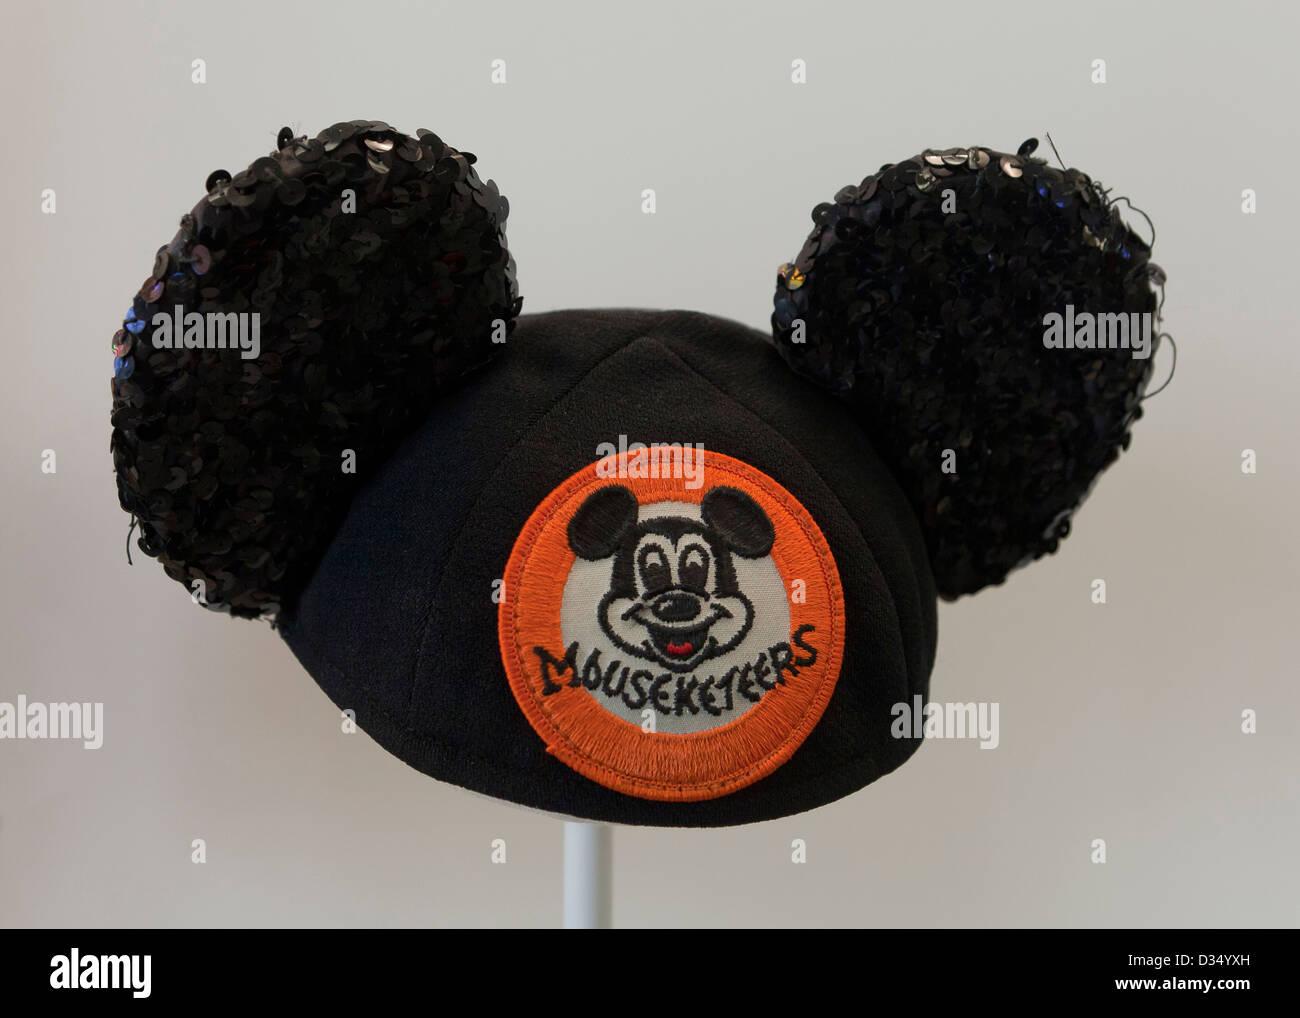 ec7f5adeb3b Mickey Mouse Ears Stock Photos   Mickey Mouse Ears Stock Images - Alamy